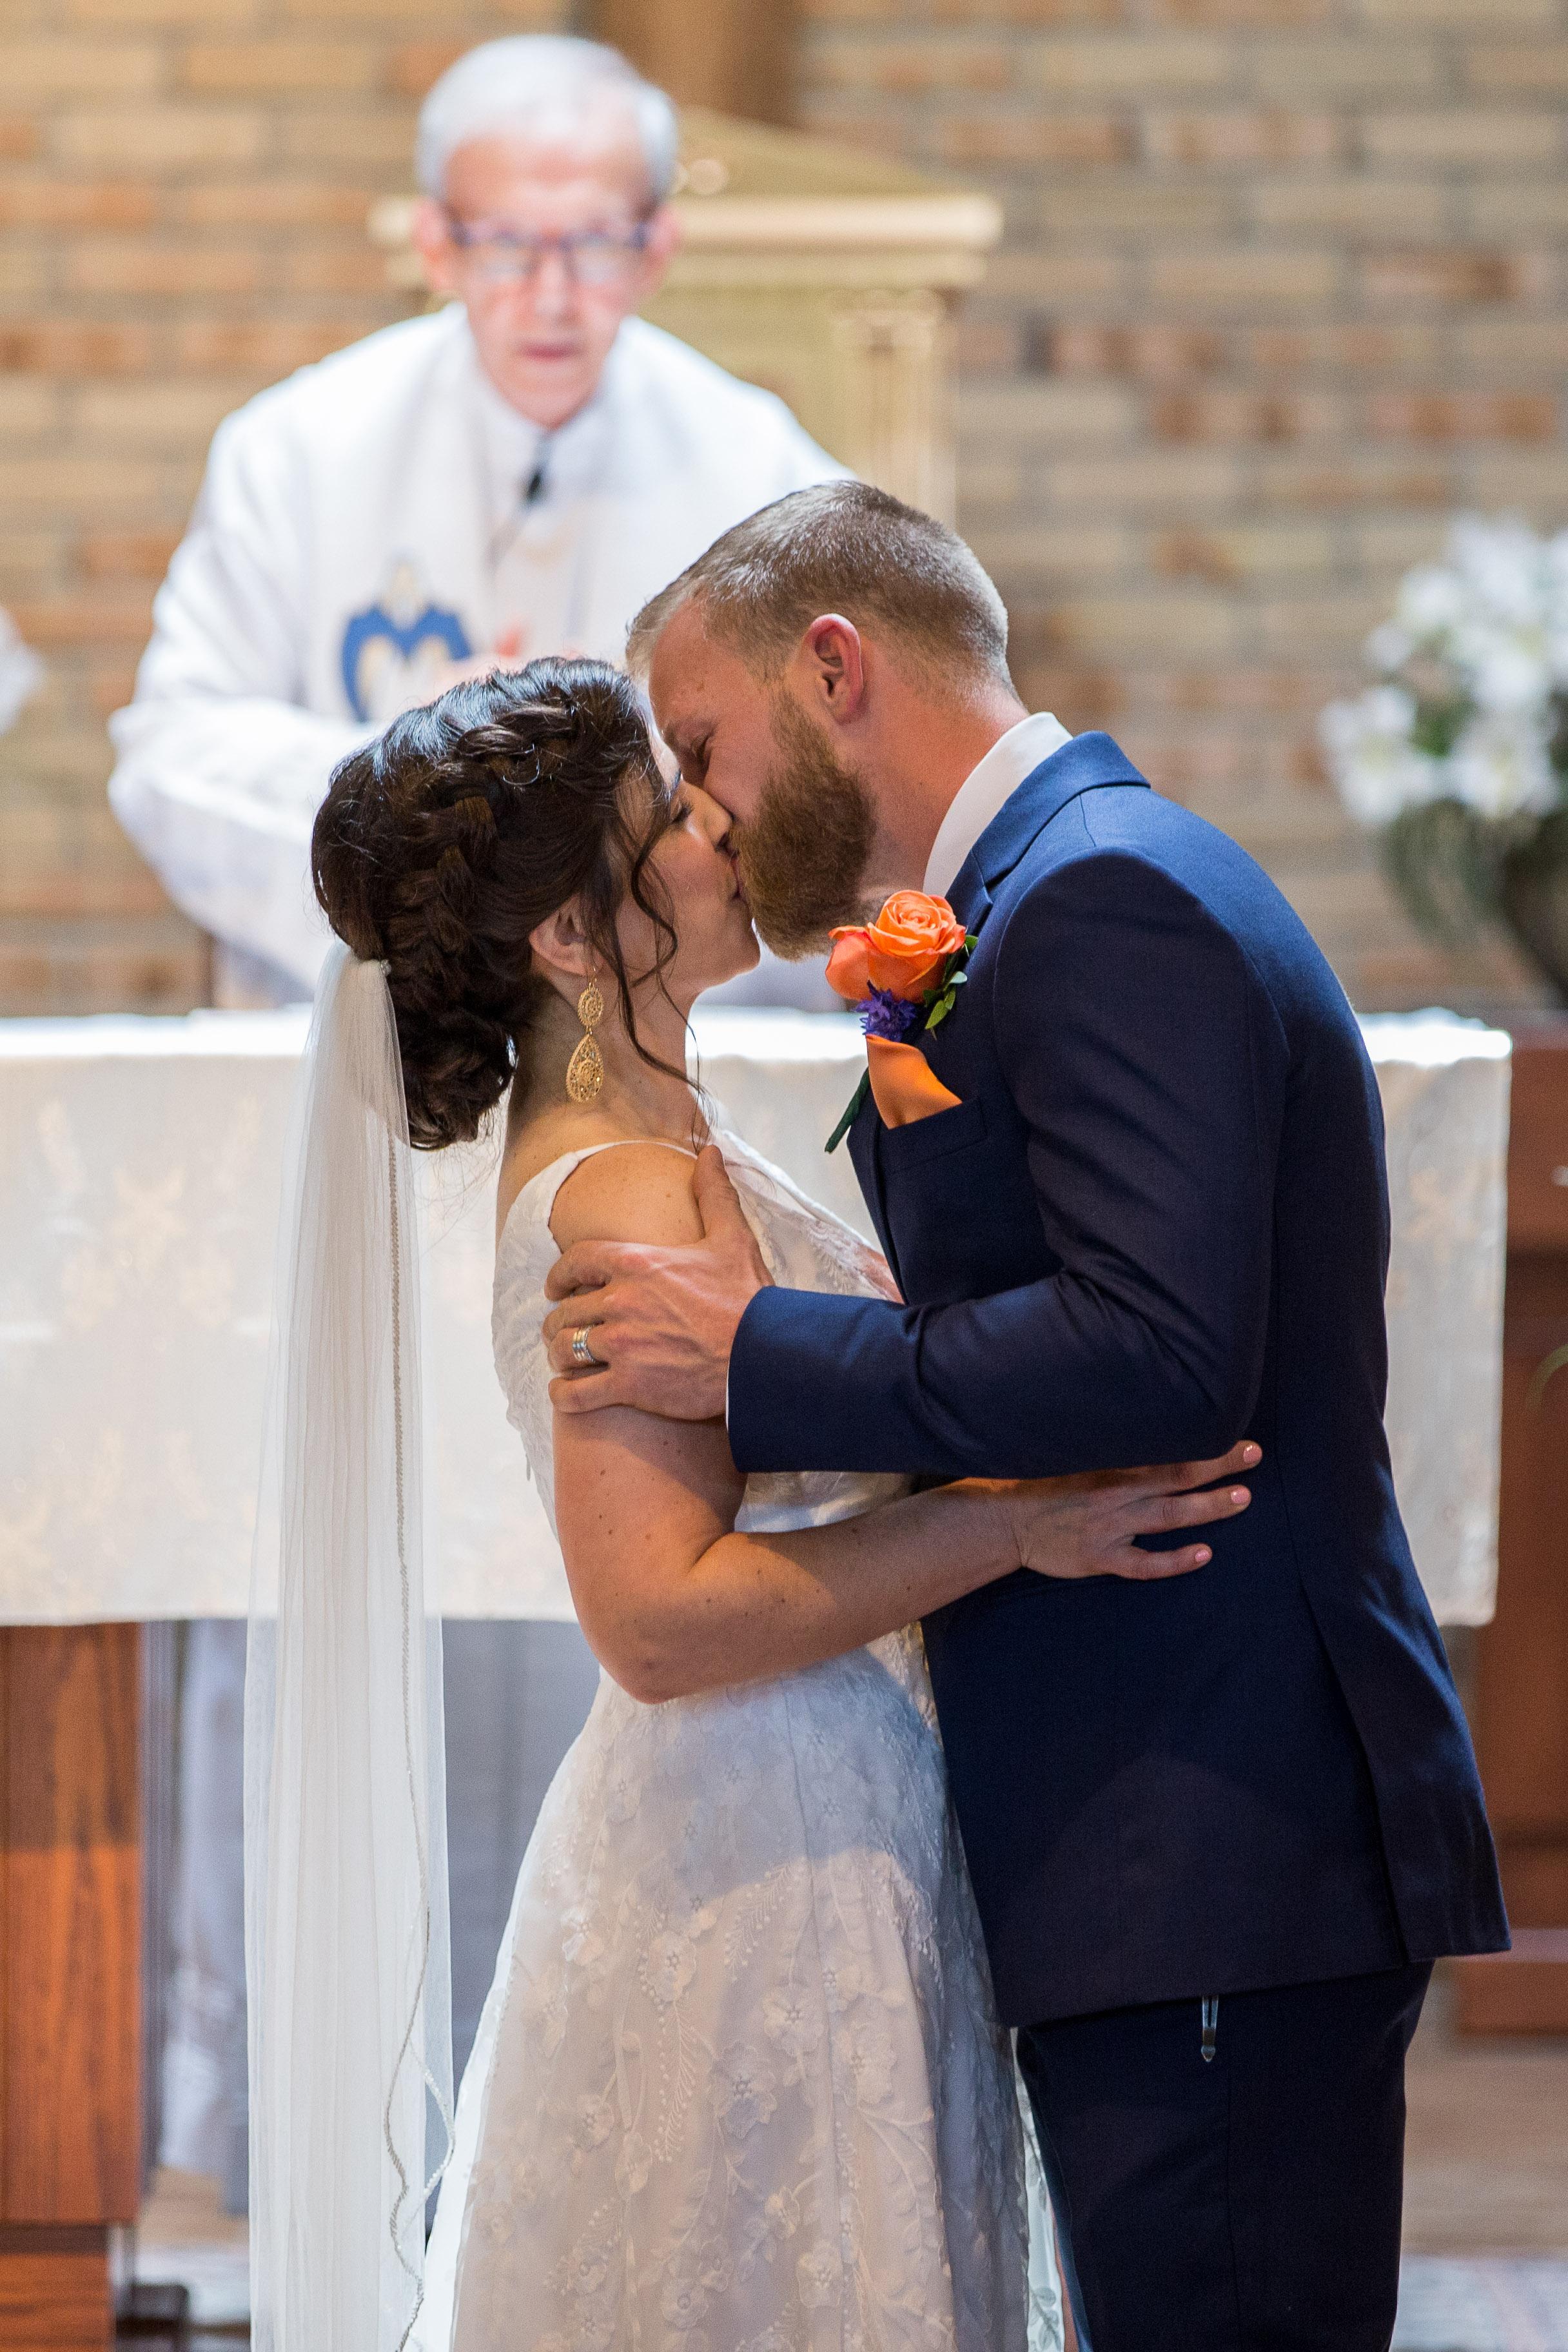 Natalie and Dallas Mooney Wedding 6-8-19_Tania Watt Photography-143.jpg